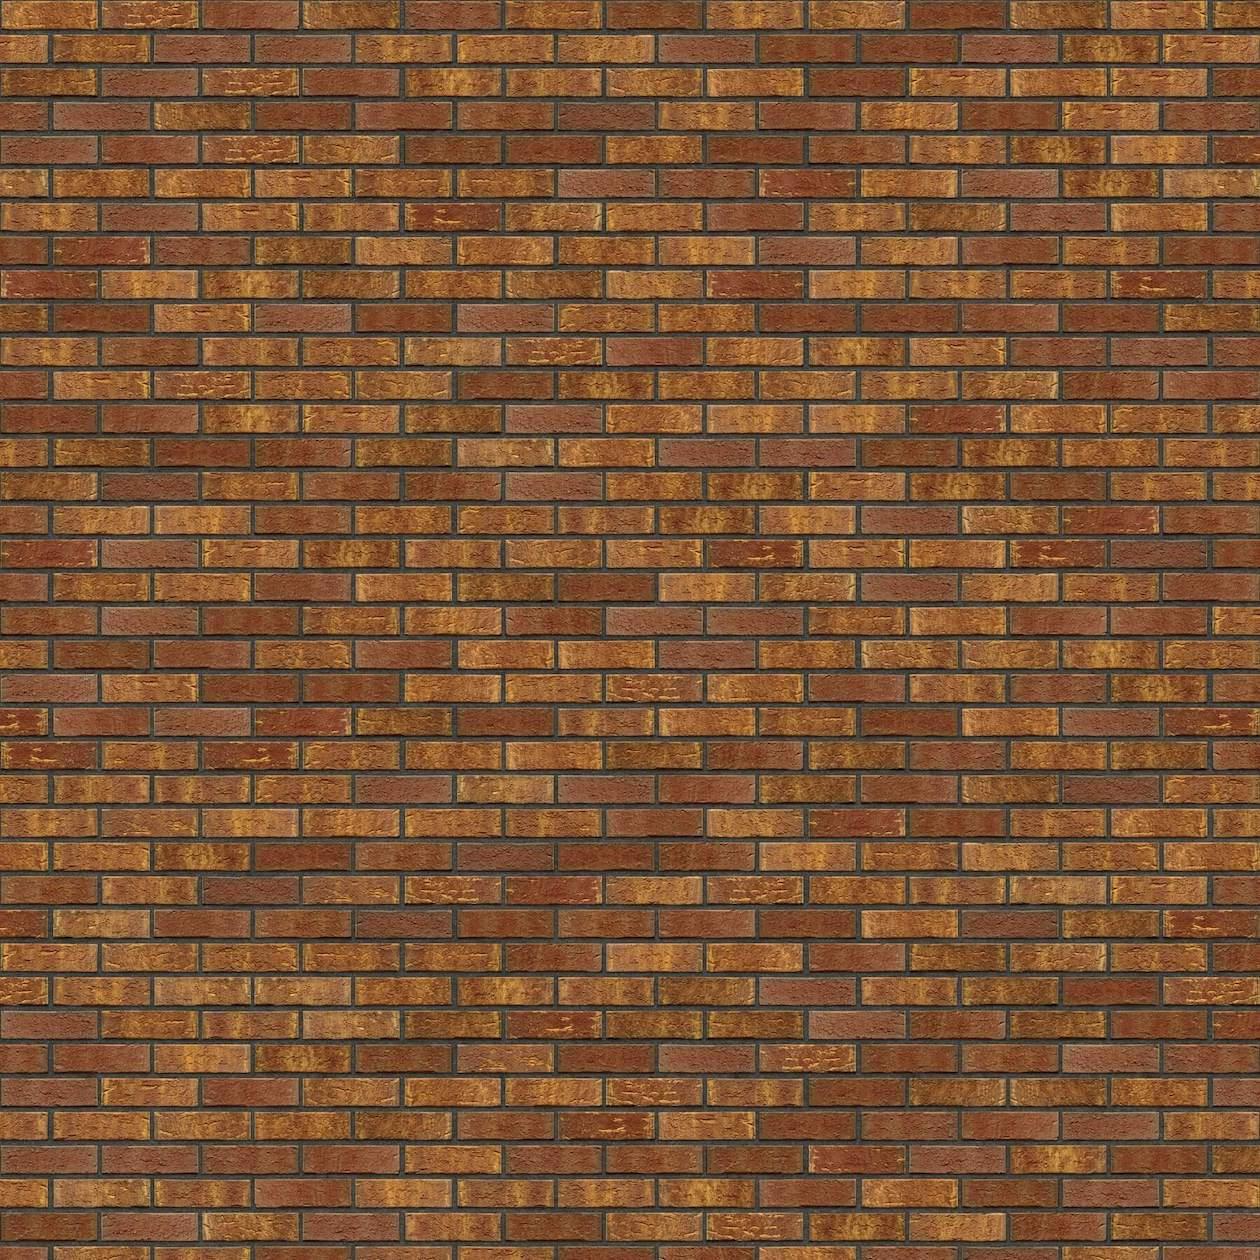 Puna-cigla-FeldHaus-Klinker-brick-house-nf-k-686-Antracit Fuga